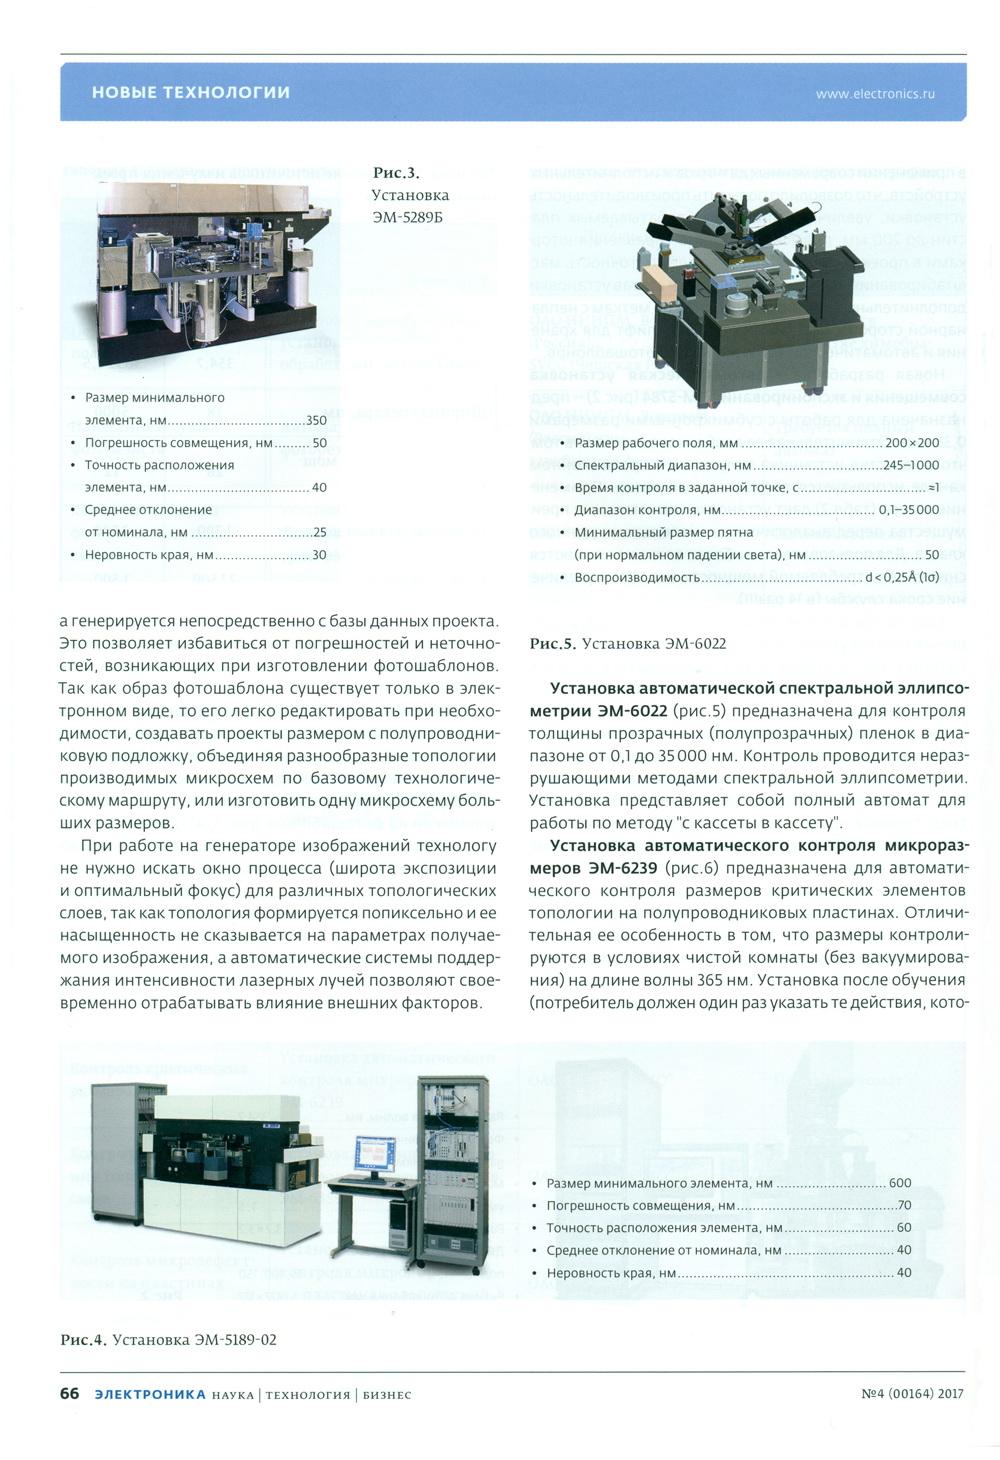 ОАО «КБТЭМ-ОМО» в журнале «Электроника: наука, технология, бизнес»